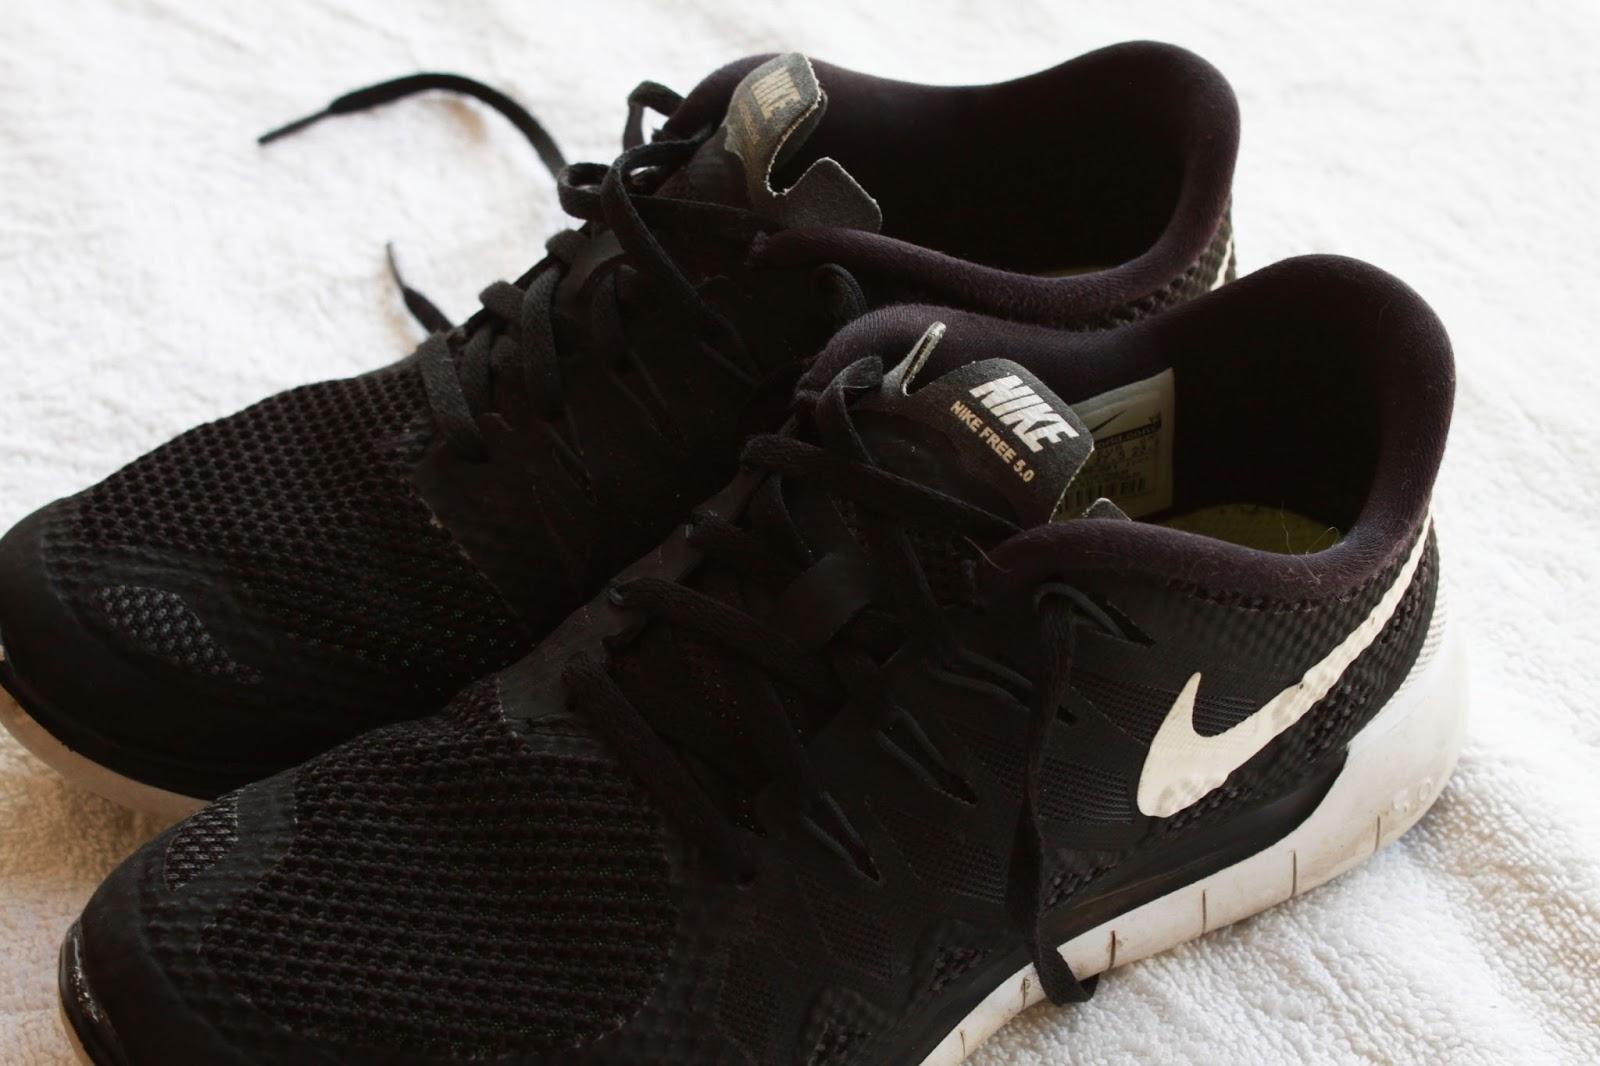 Women's Nike Free Run 5.0 Black and White